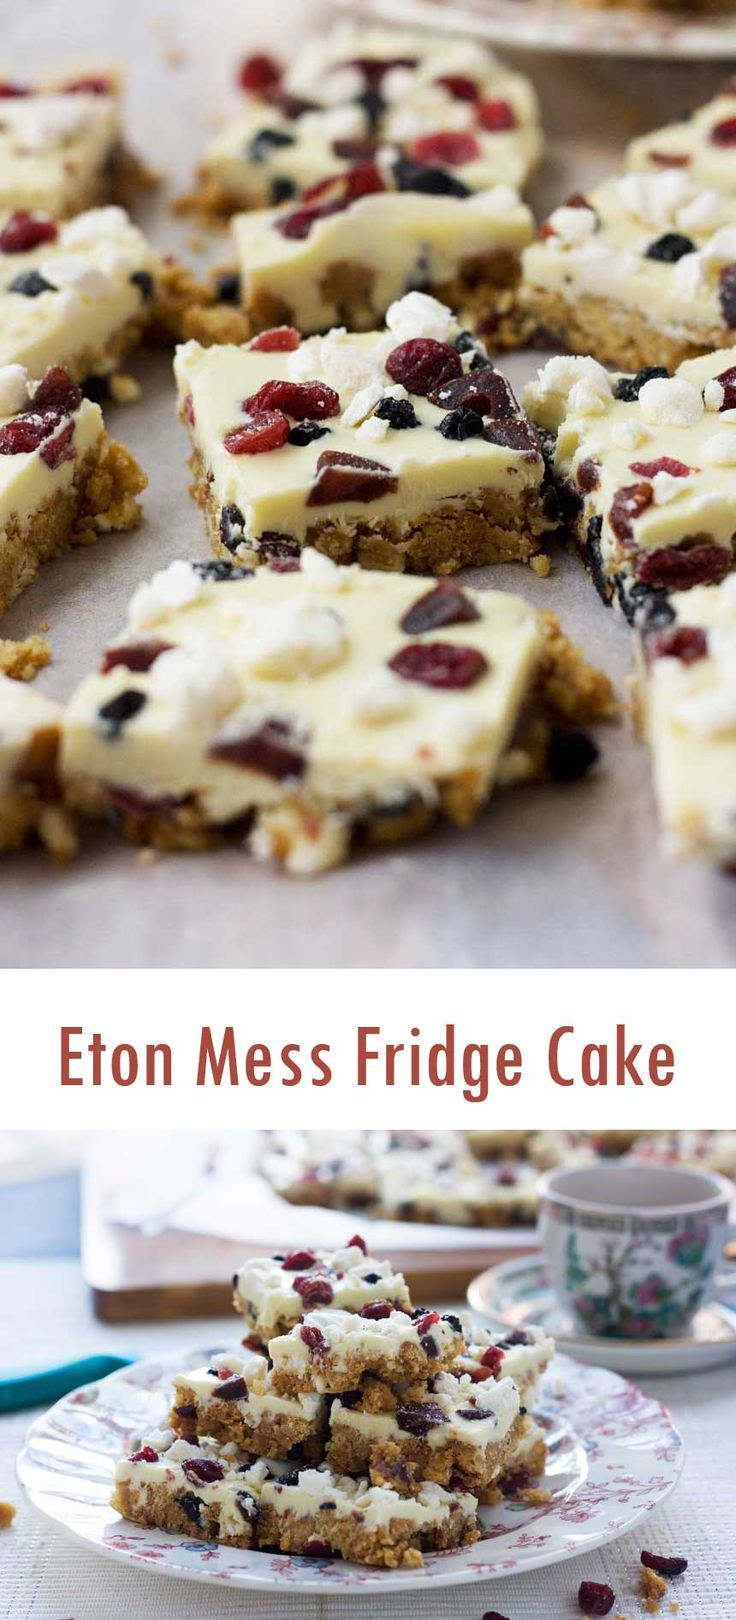 Eton Mess Fridge cake - with all the flavours of a British Eton Mess!